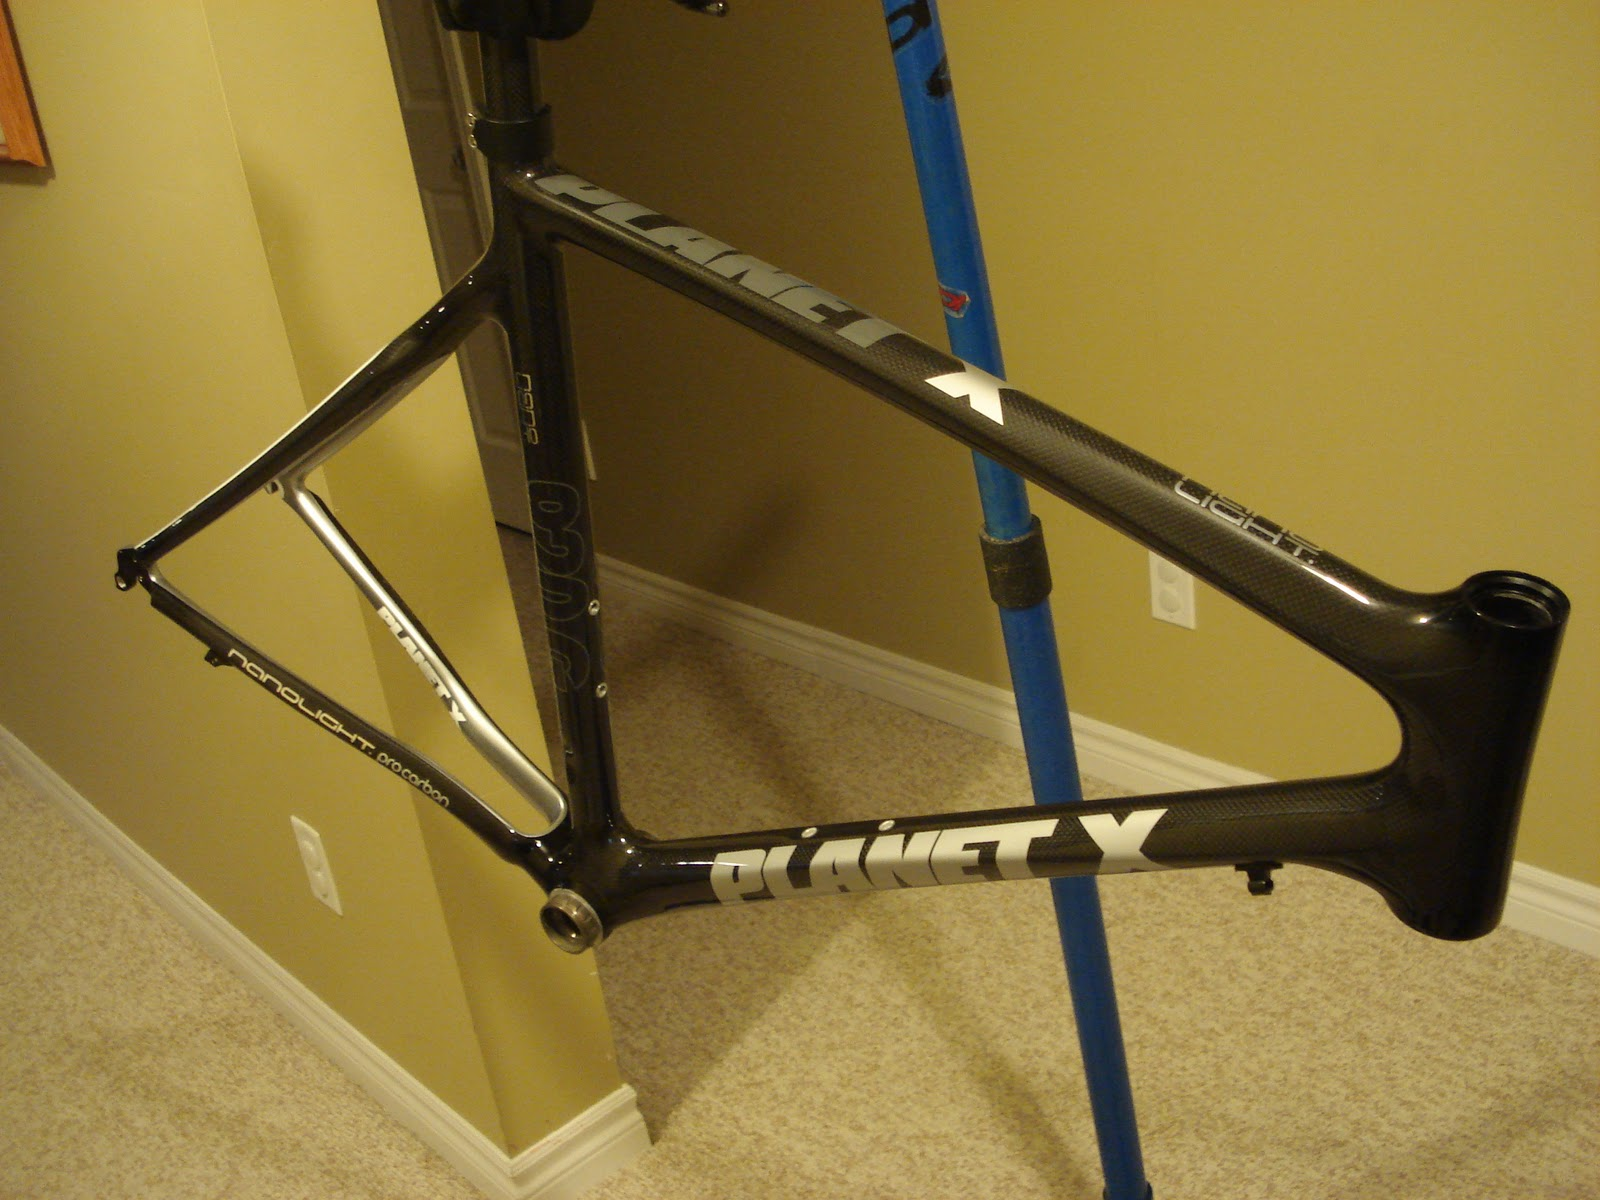 Cycling review: Planet X Nano light frame set review Part 1